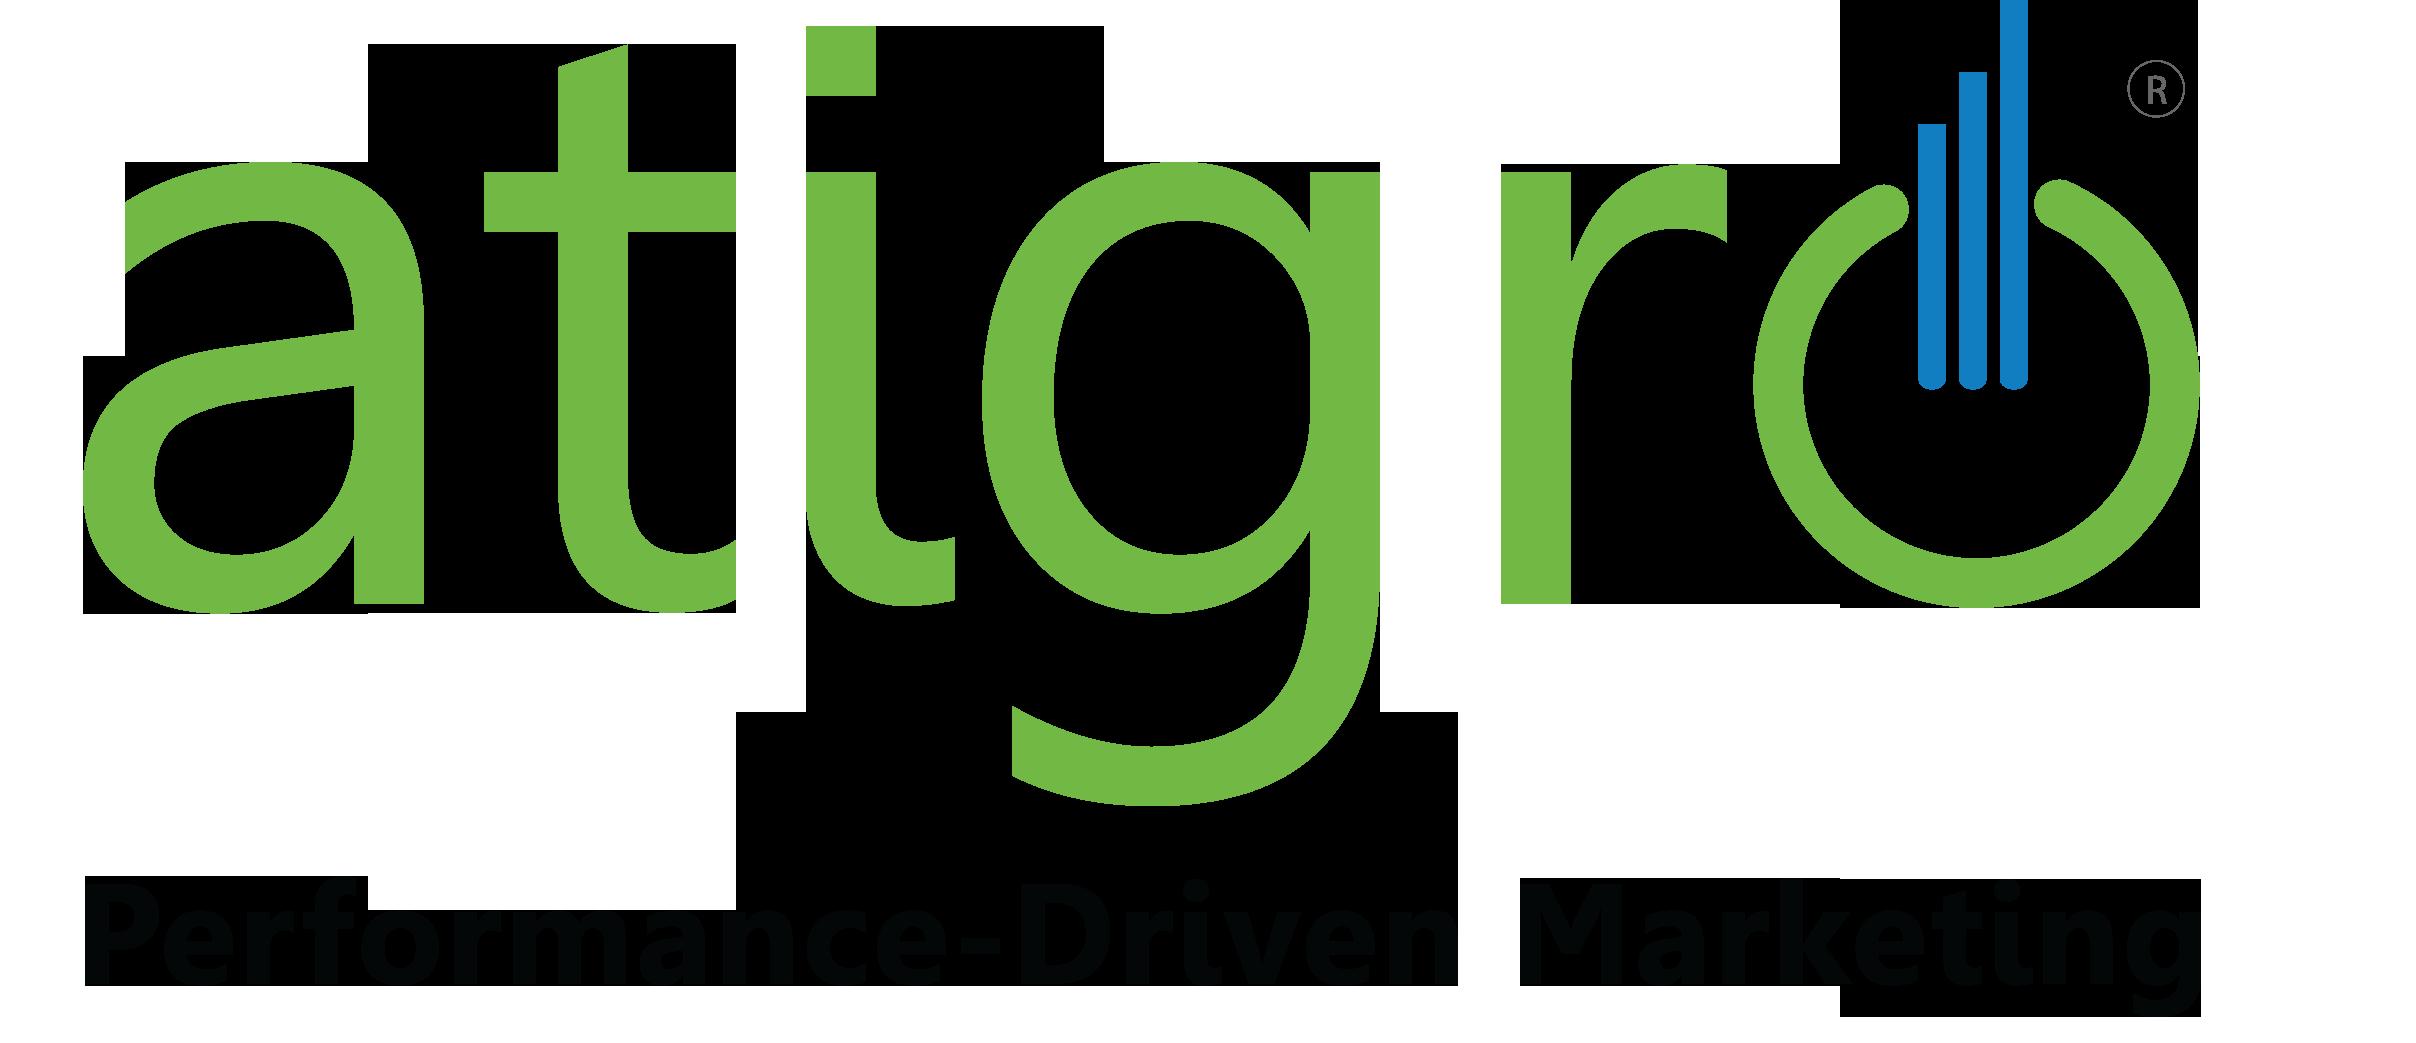 Performance-Driven Marketing